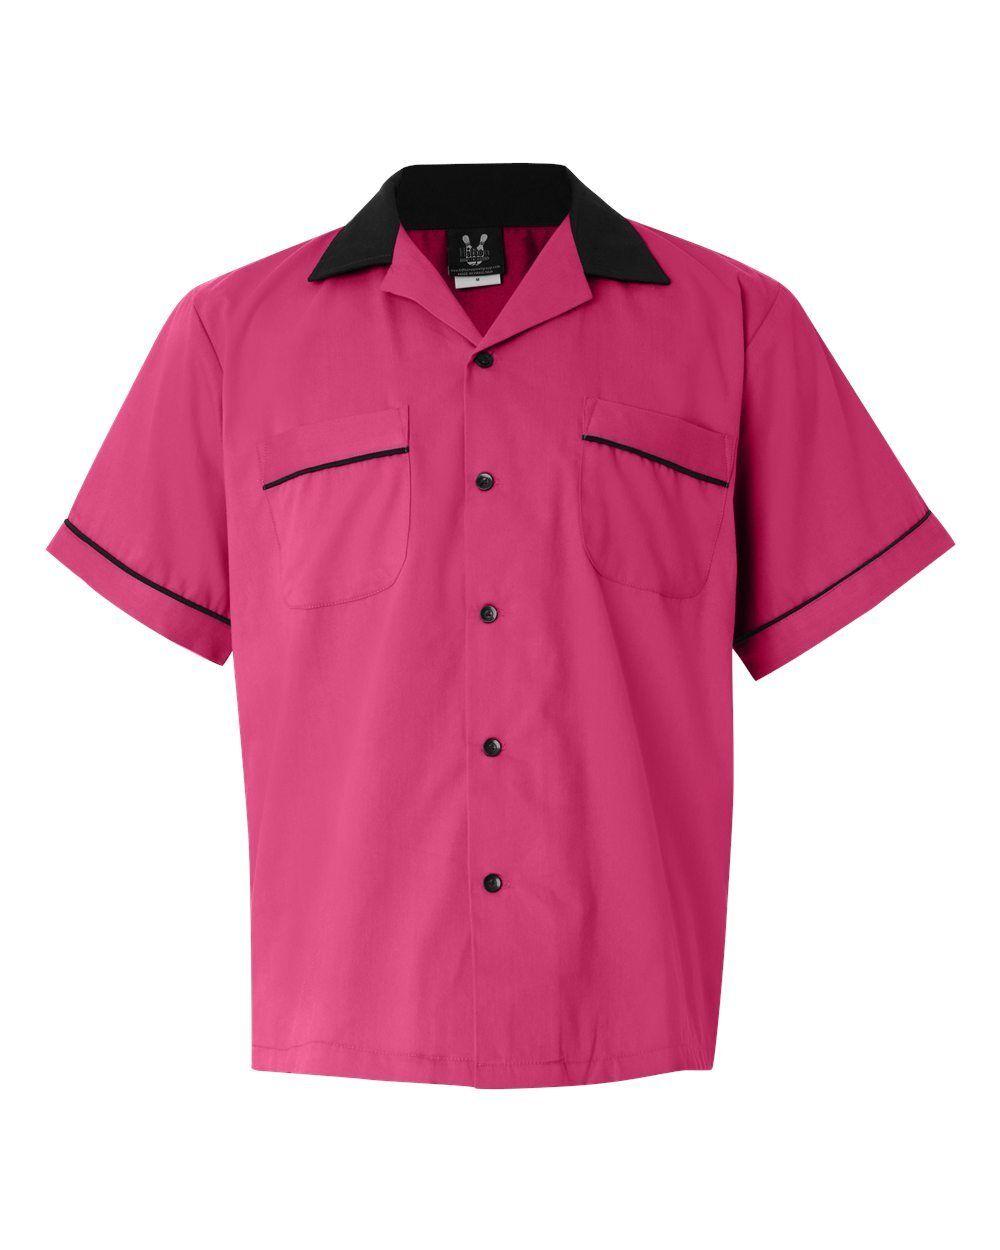 Hilton gm legend retro bowling shirt mens womens size s for Womens golf shirts xxl